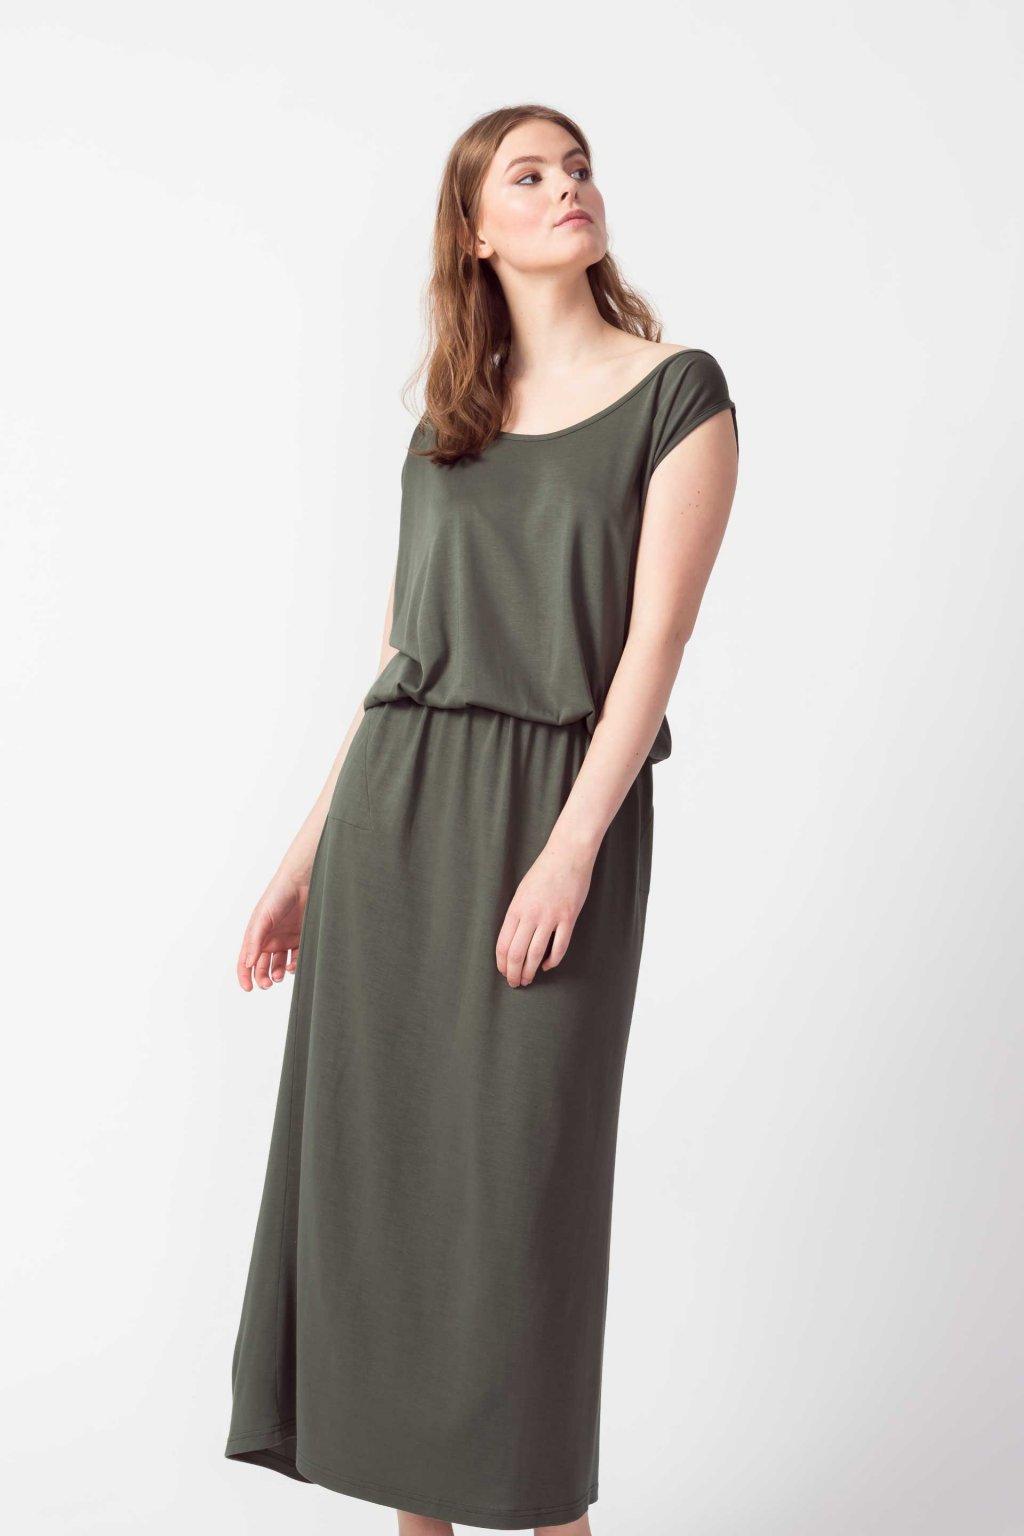 dress ecovero betula skfk wdr00916 x8 ofb